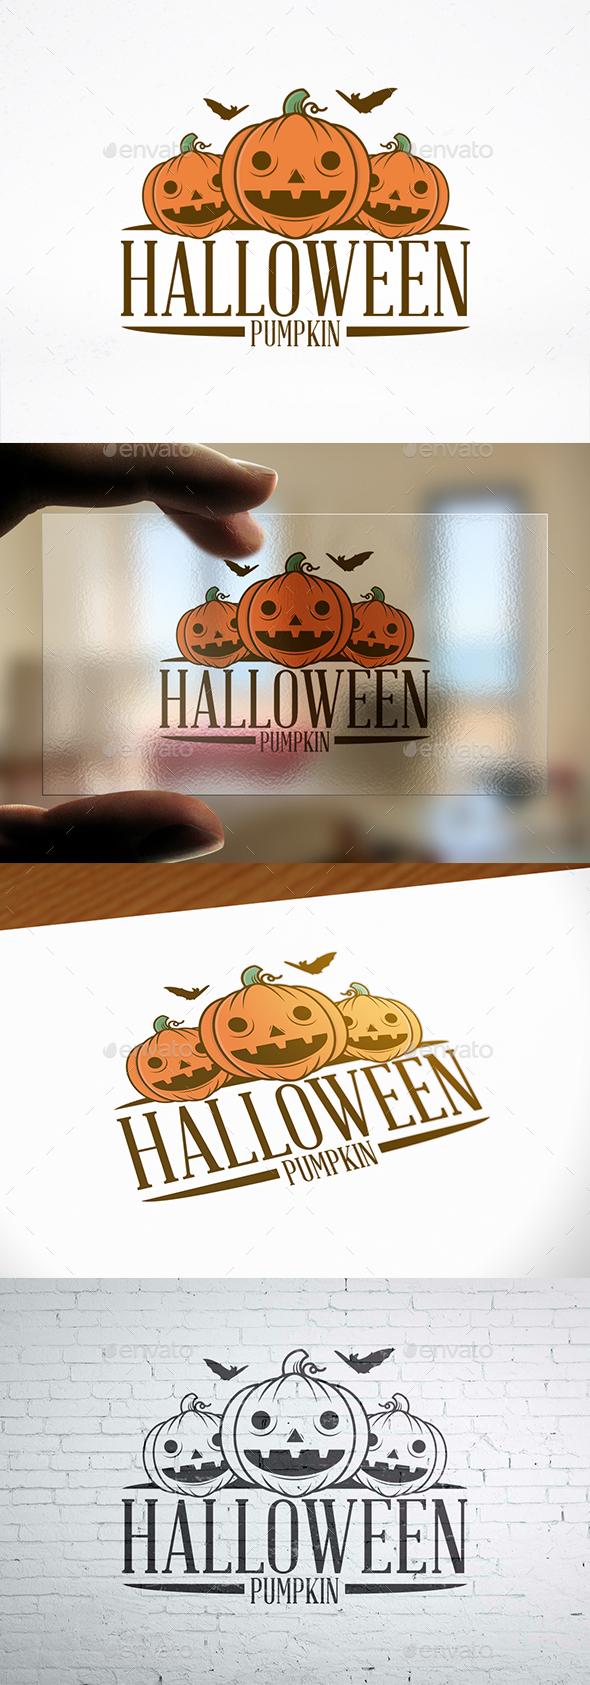 Halloween Pumpkin Illustrative Logo